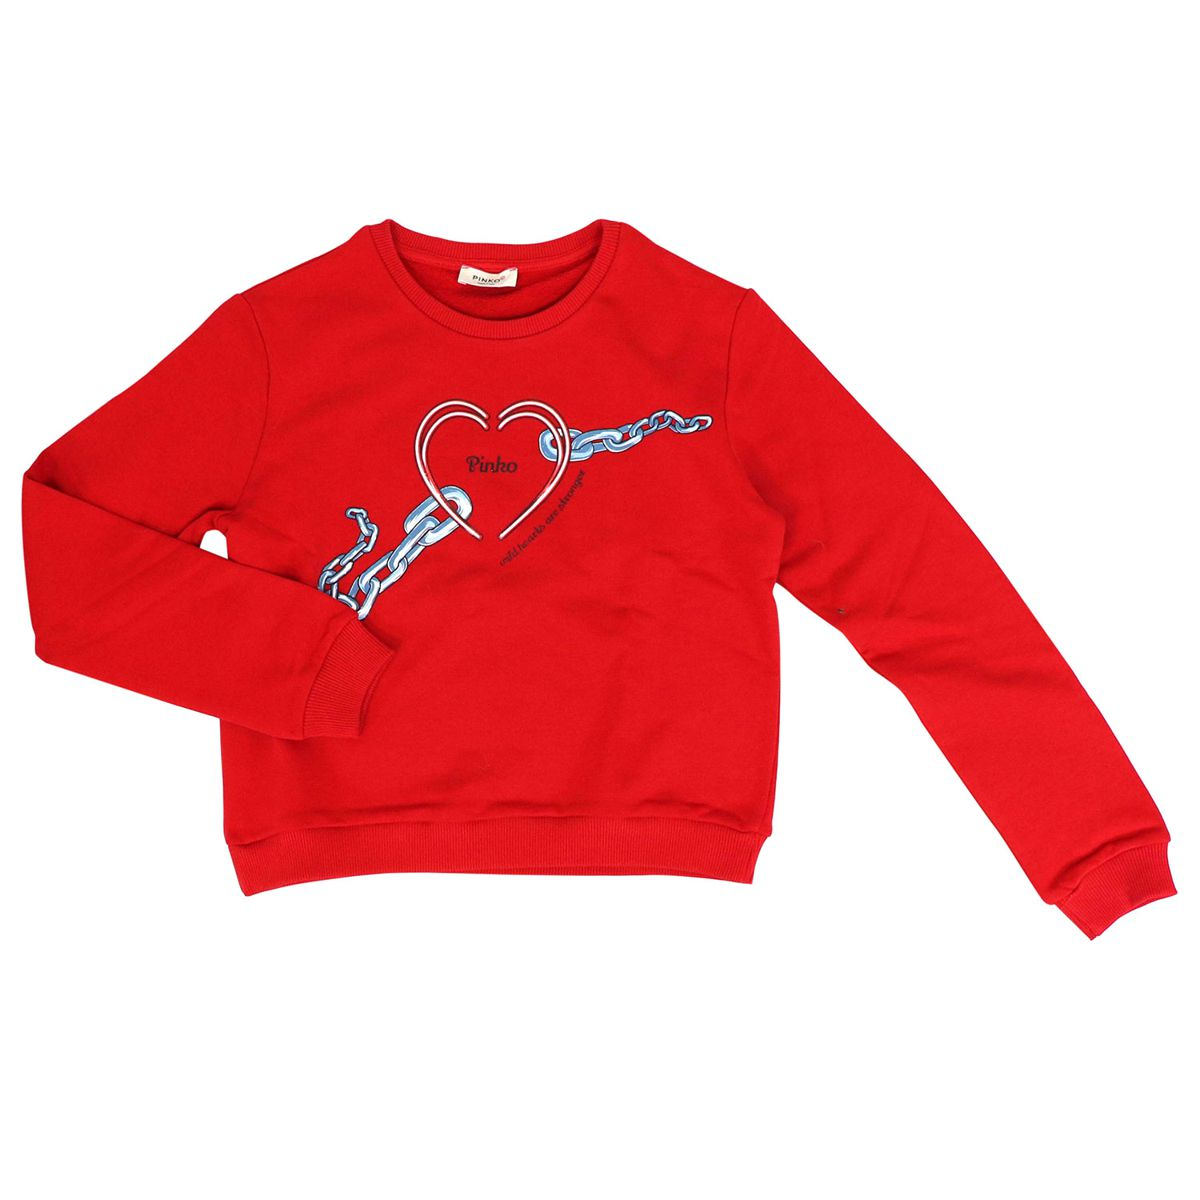 Crew neck sweatshirt with heart print MEDICO Red Pinko